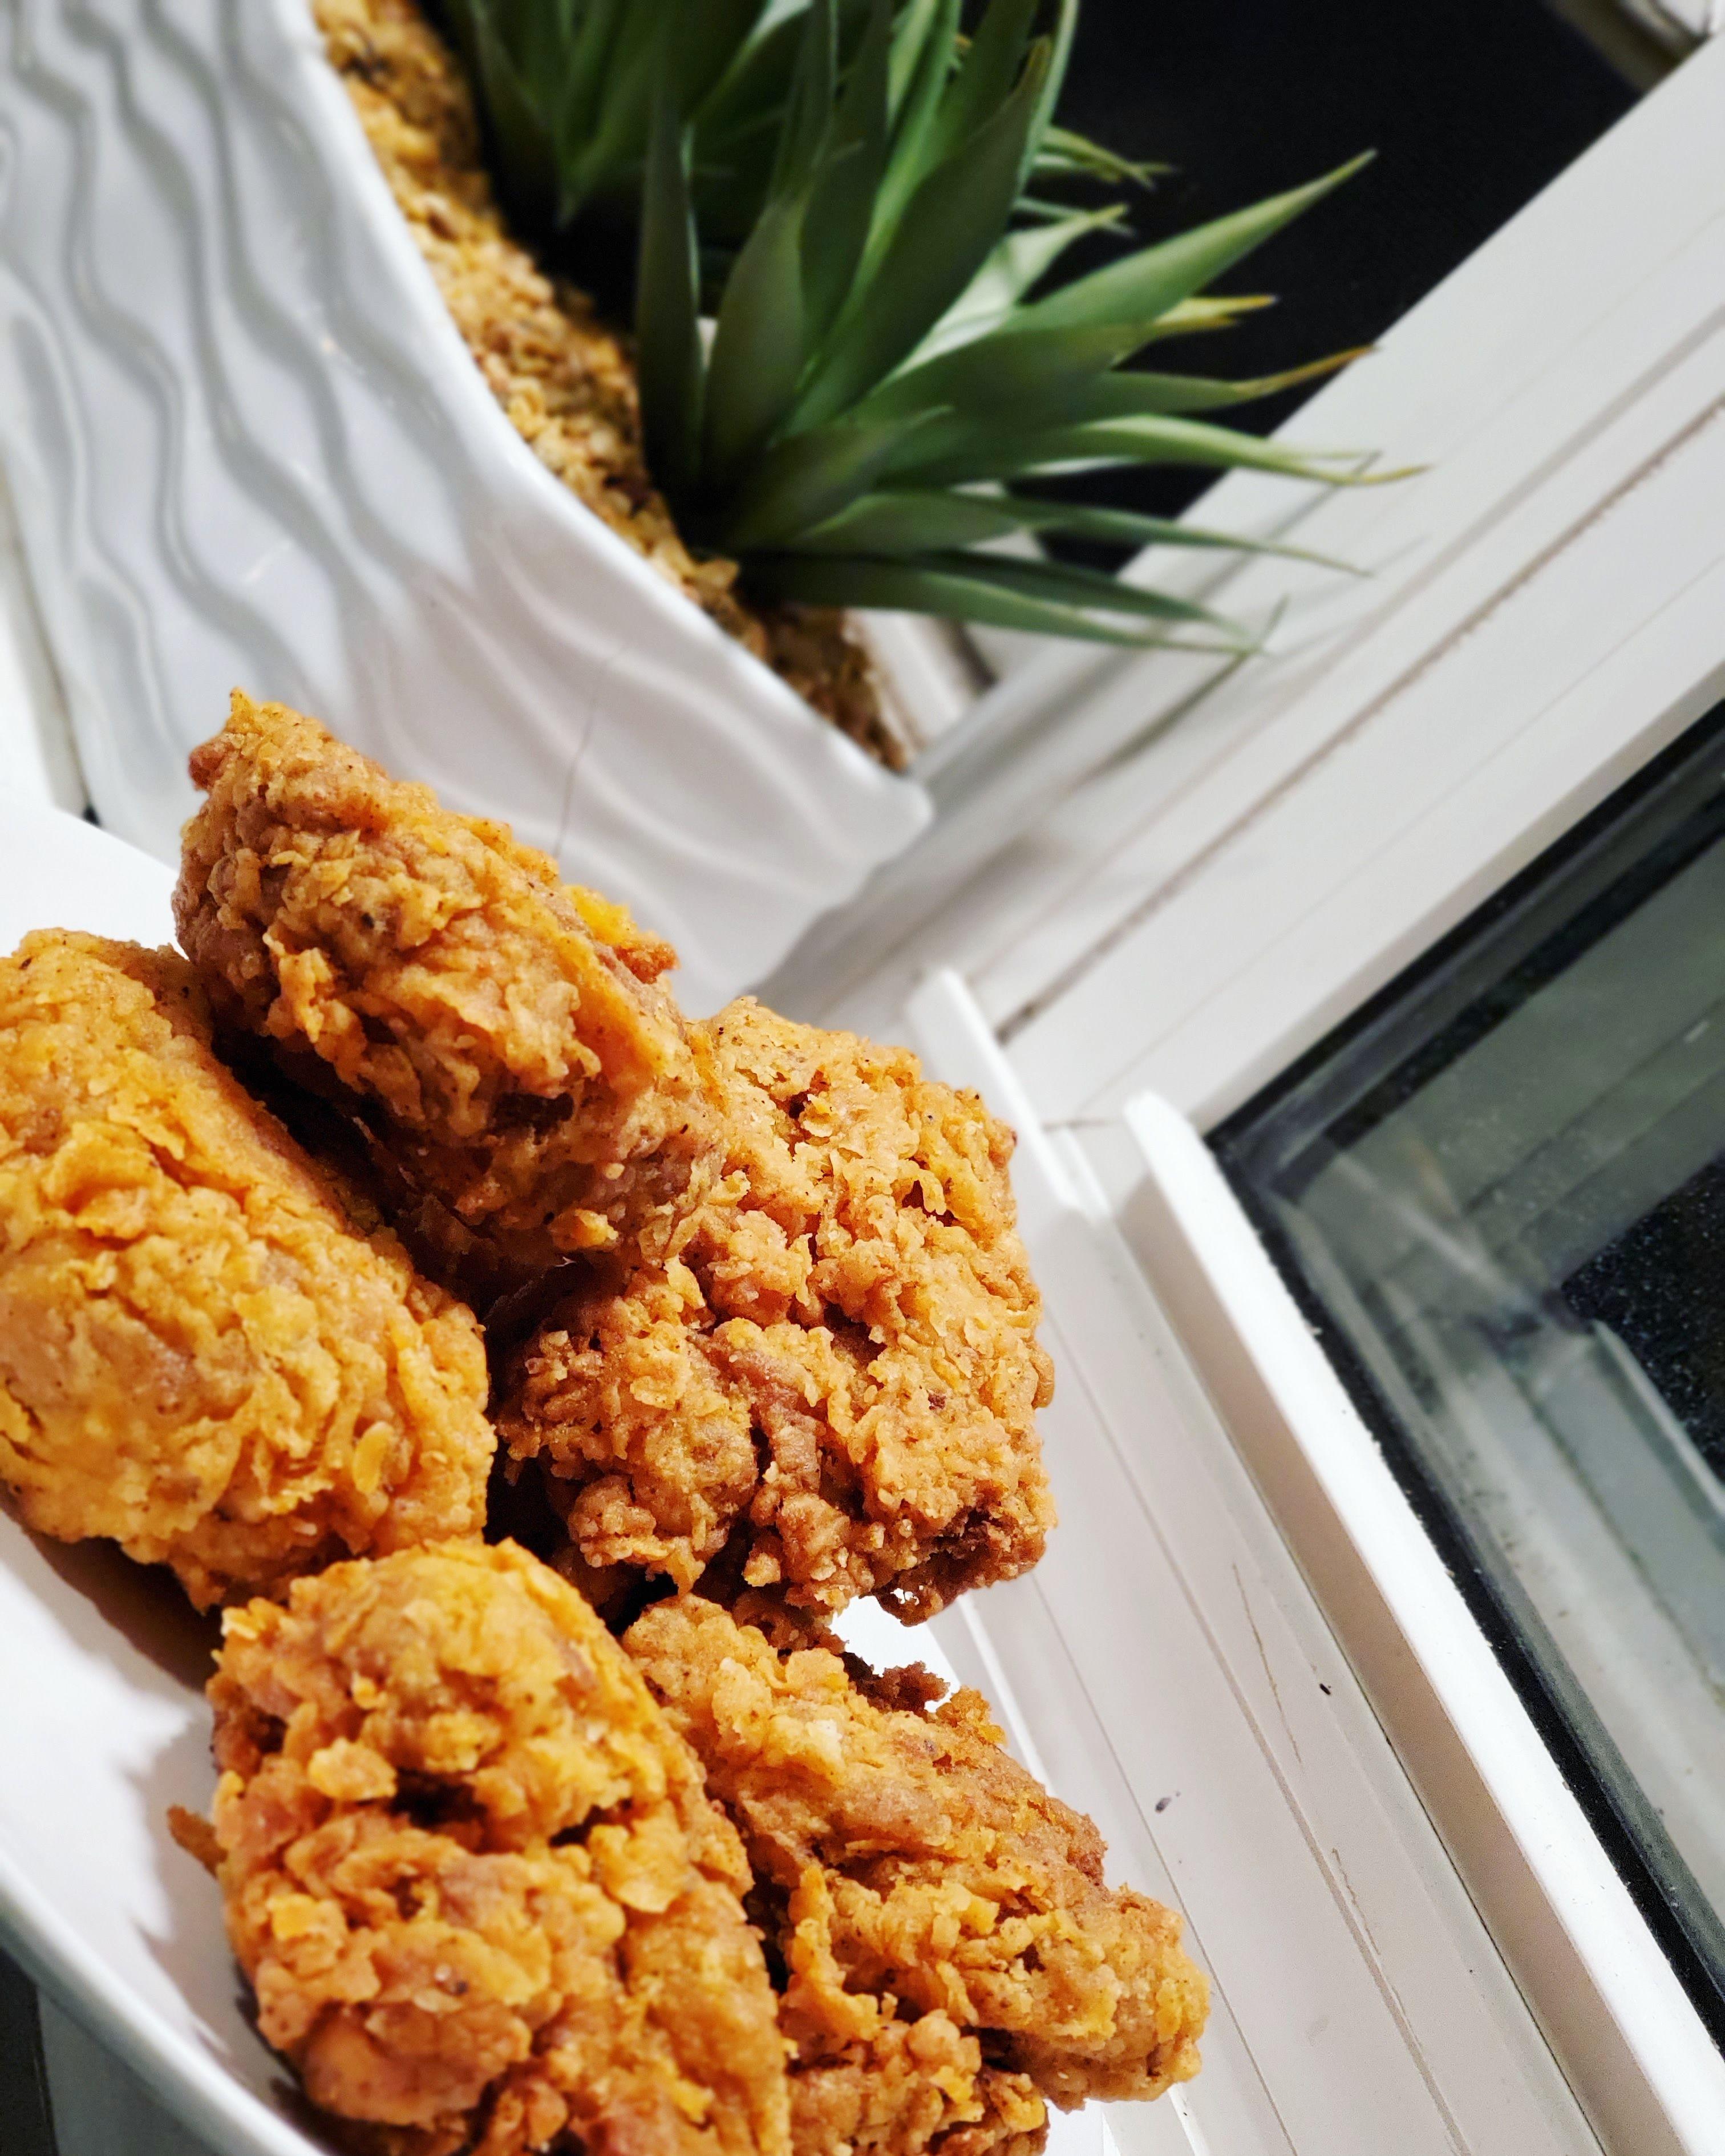 Best Tasting Vegan Fried Chicken In 2020 Vegan Fried Chicken Vegan Fries Delicious Vegan Recipes